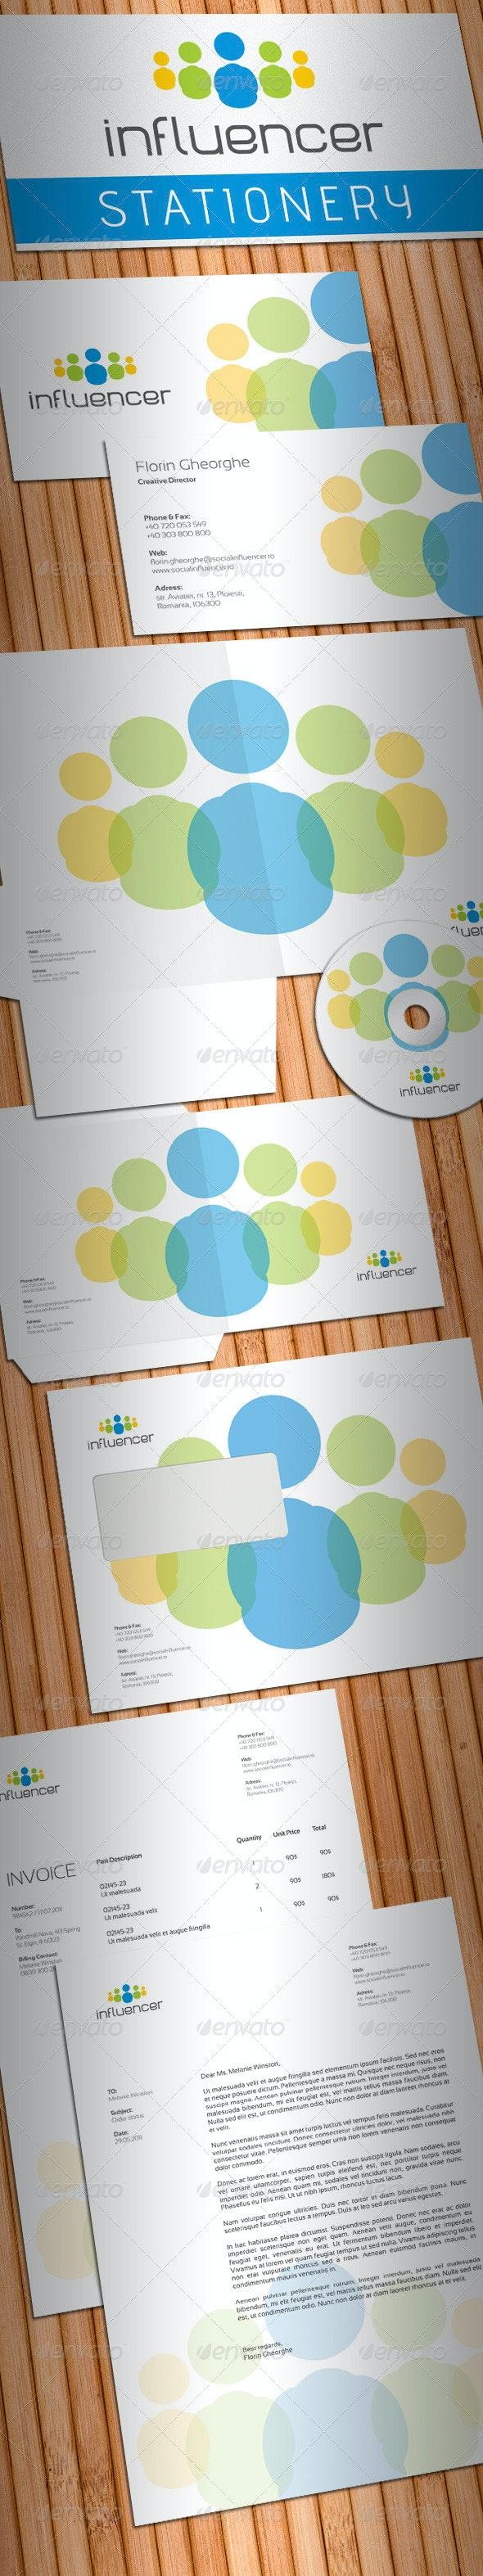 Social Media Influencer Stationery - Stationery Print Templates